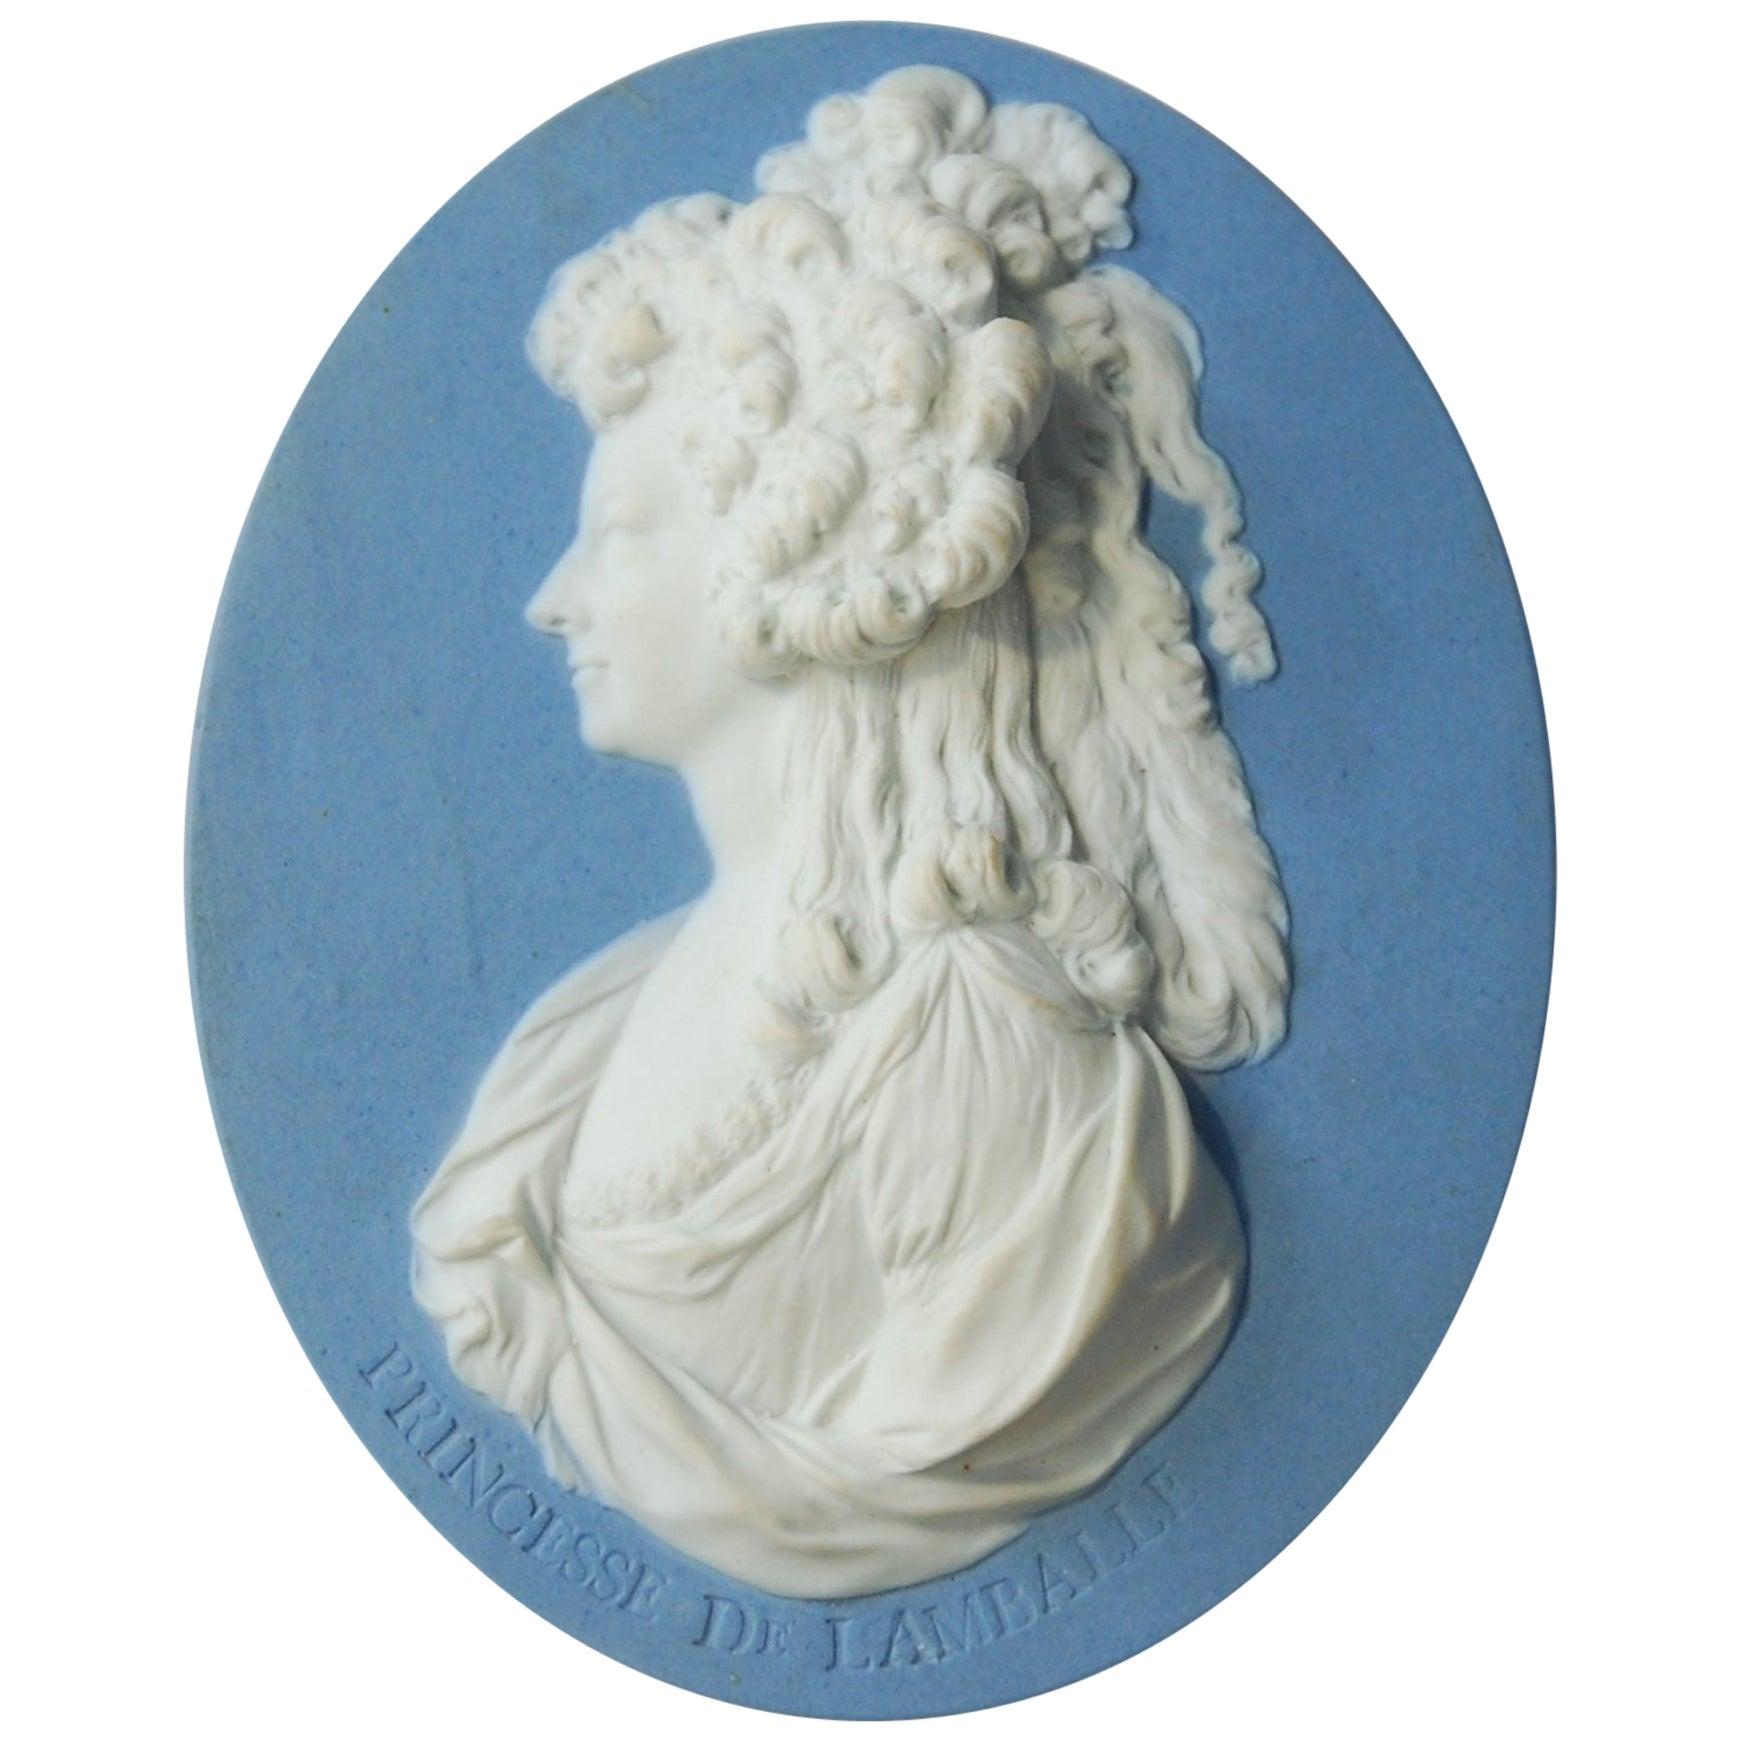 Jasperware Portrait Medallion, Princess de Lamballe, Wedgwood, circa 1790